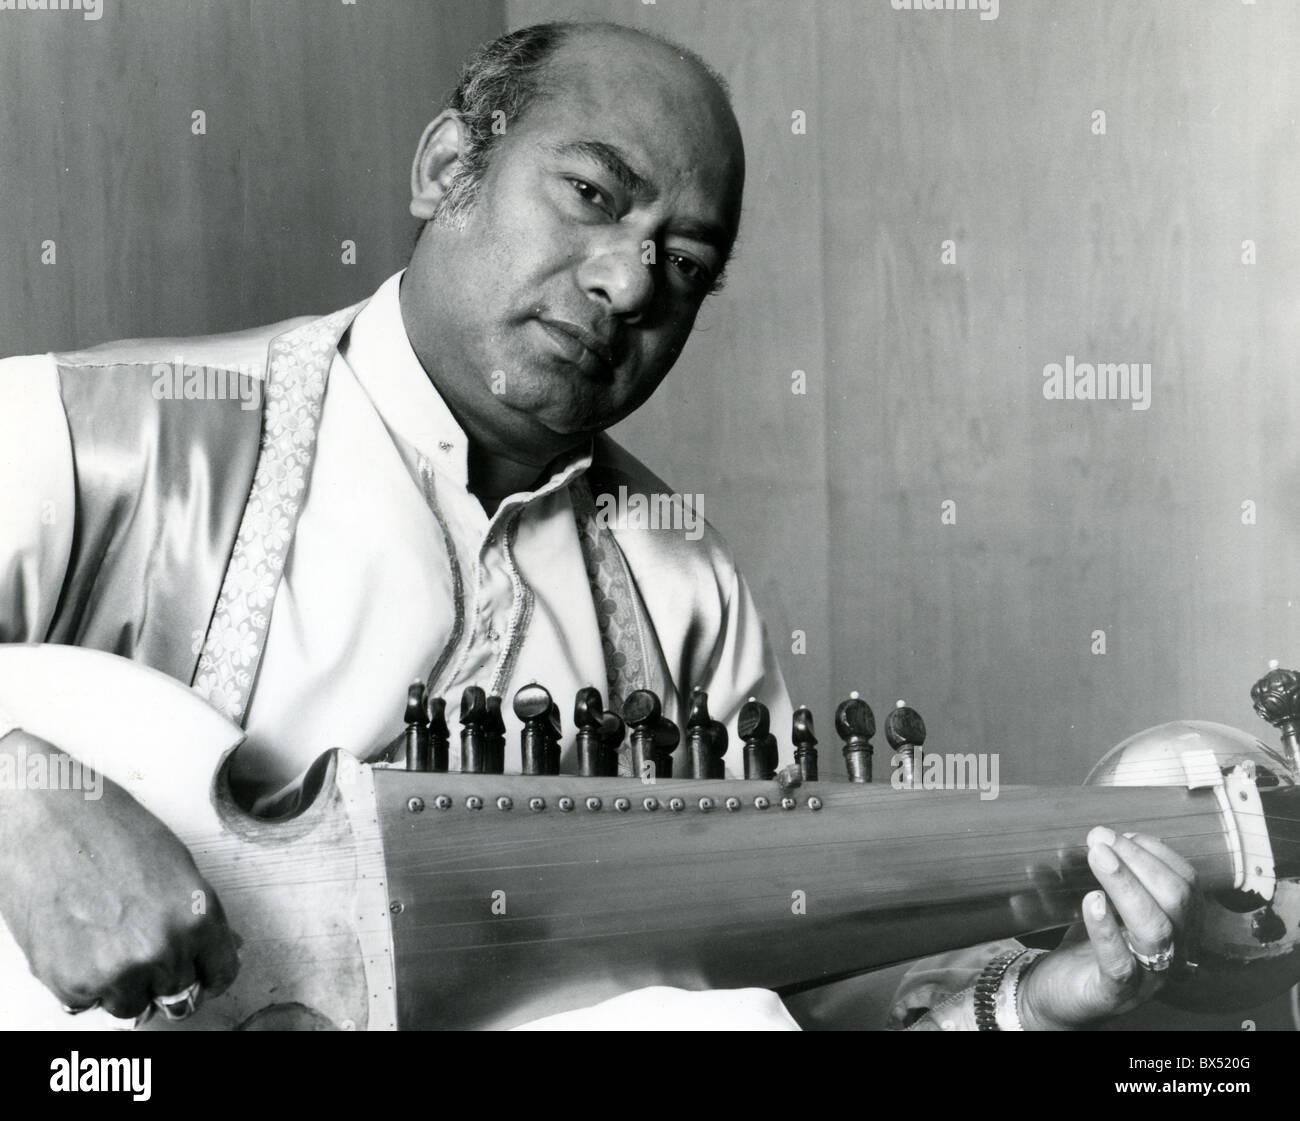 ALI AKBAR KHAN (1922-2009) Hindustani classical musician of the Maihar gharana playing a Sarod - Stock Image